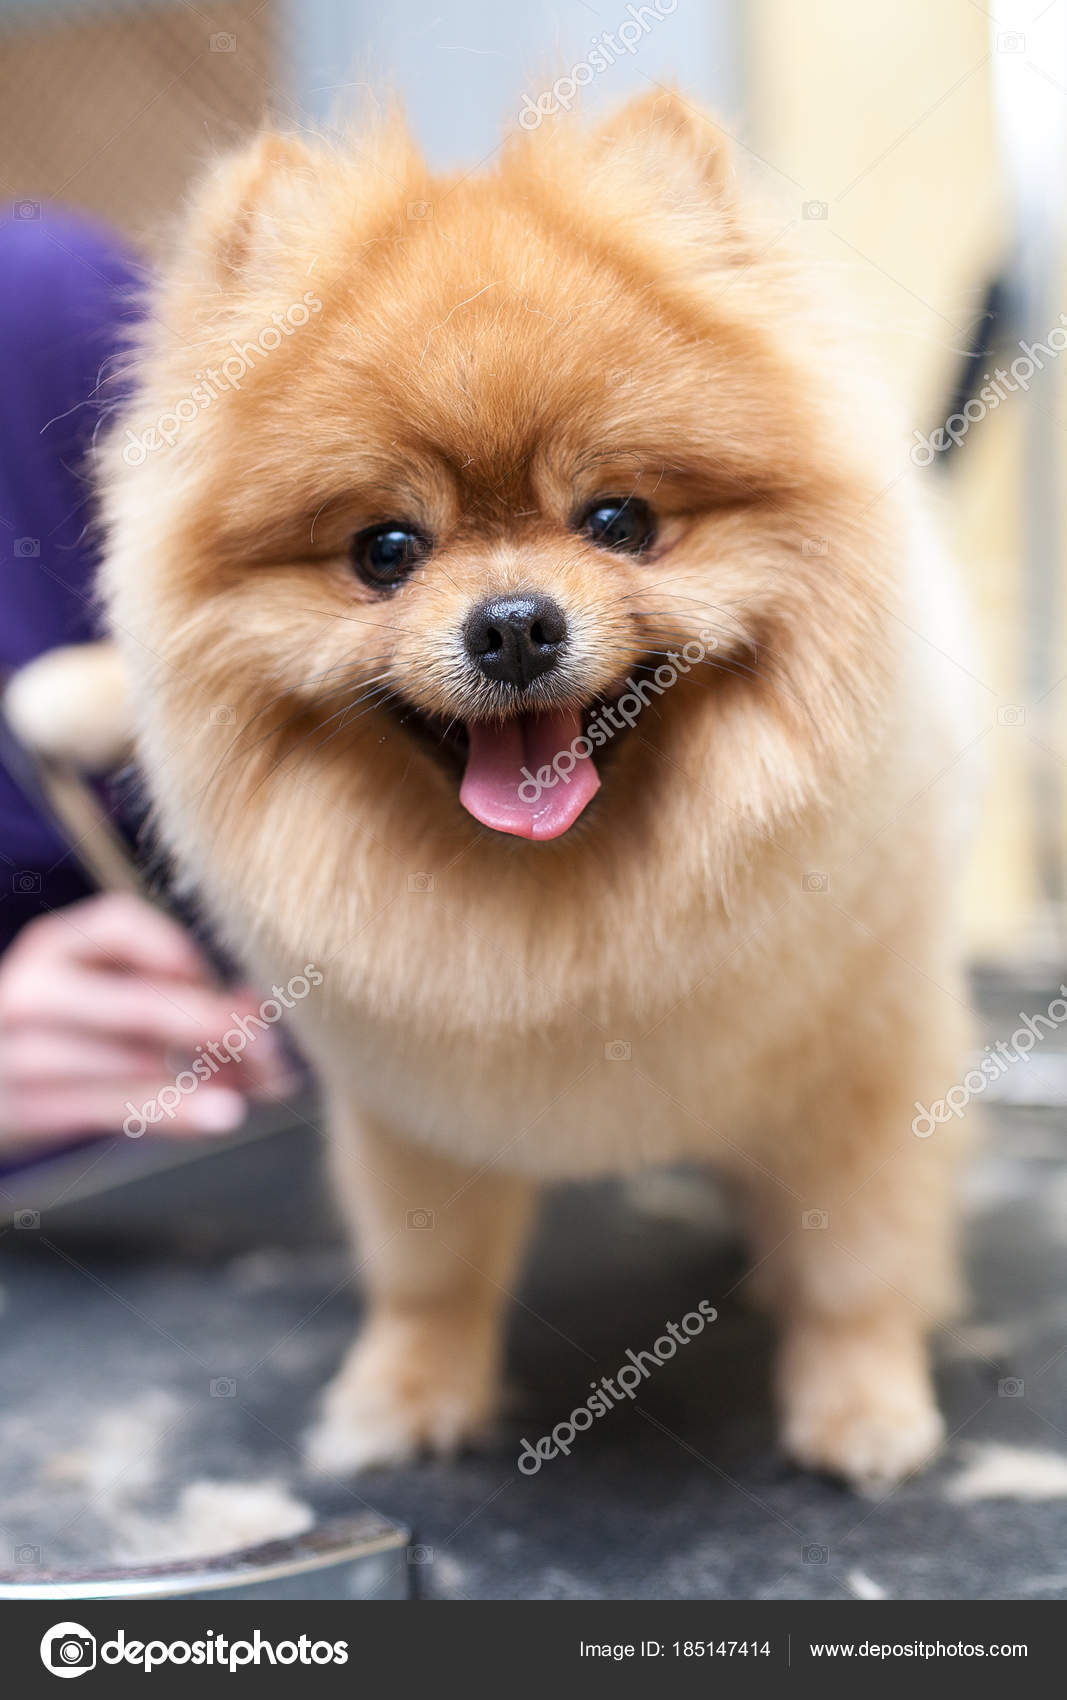 Grooming Dog Haircut Stock Photo Yemets 185147414